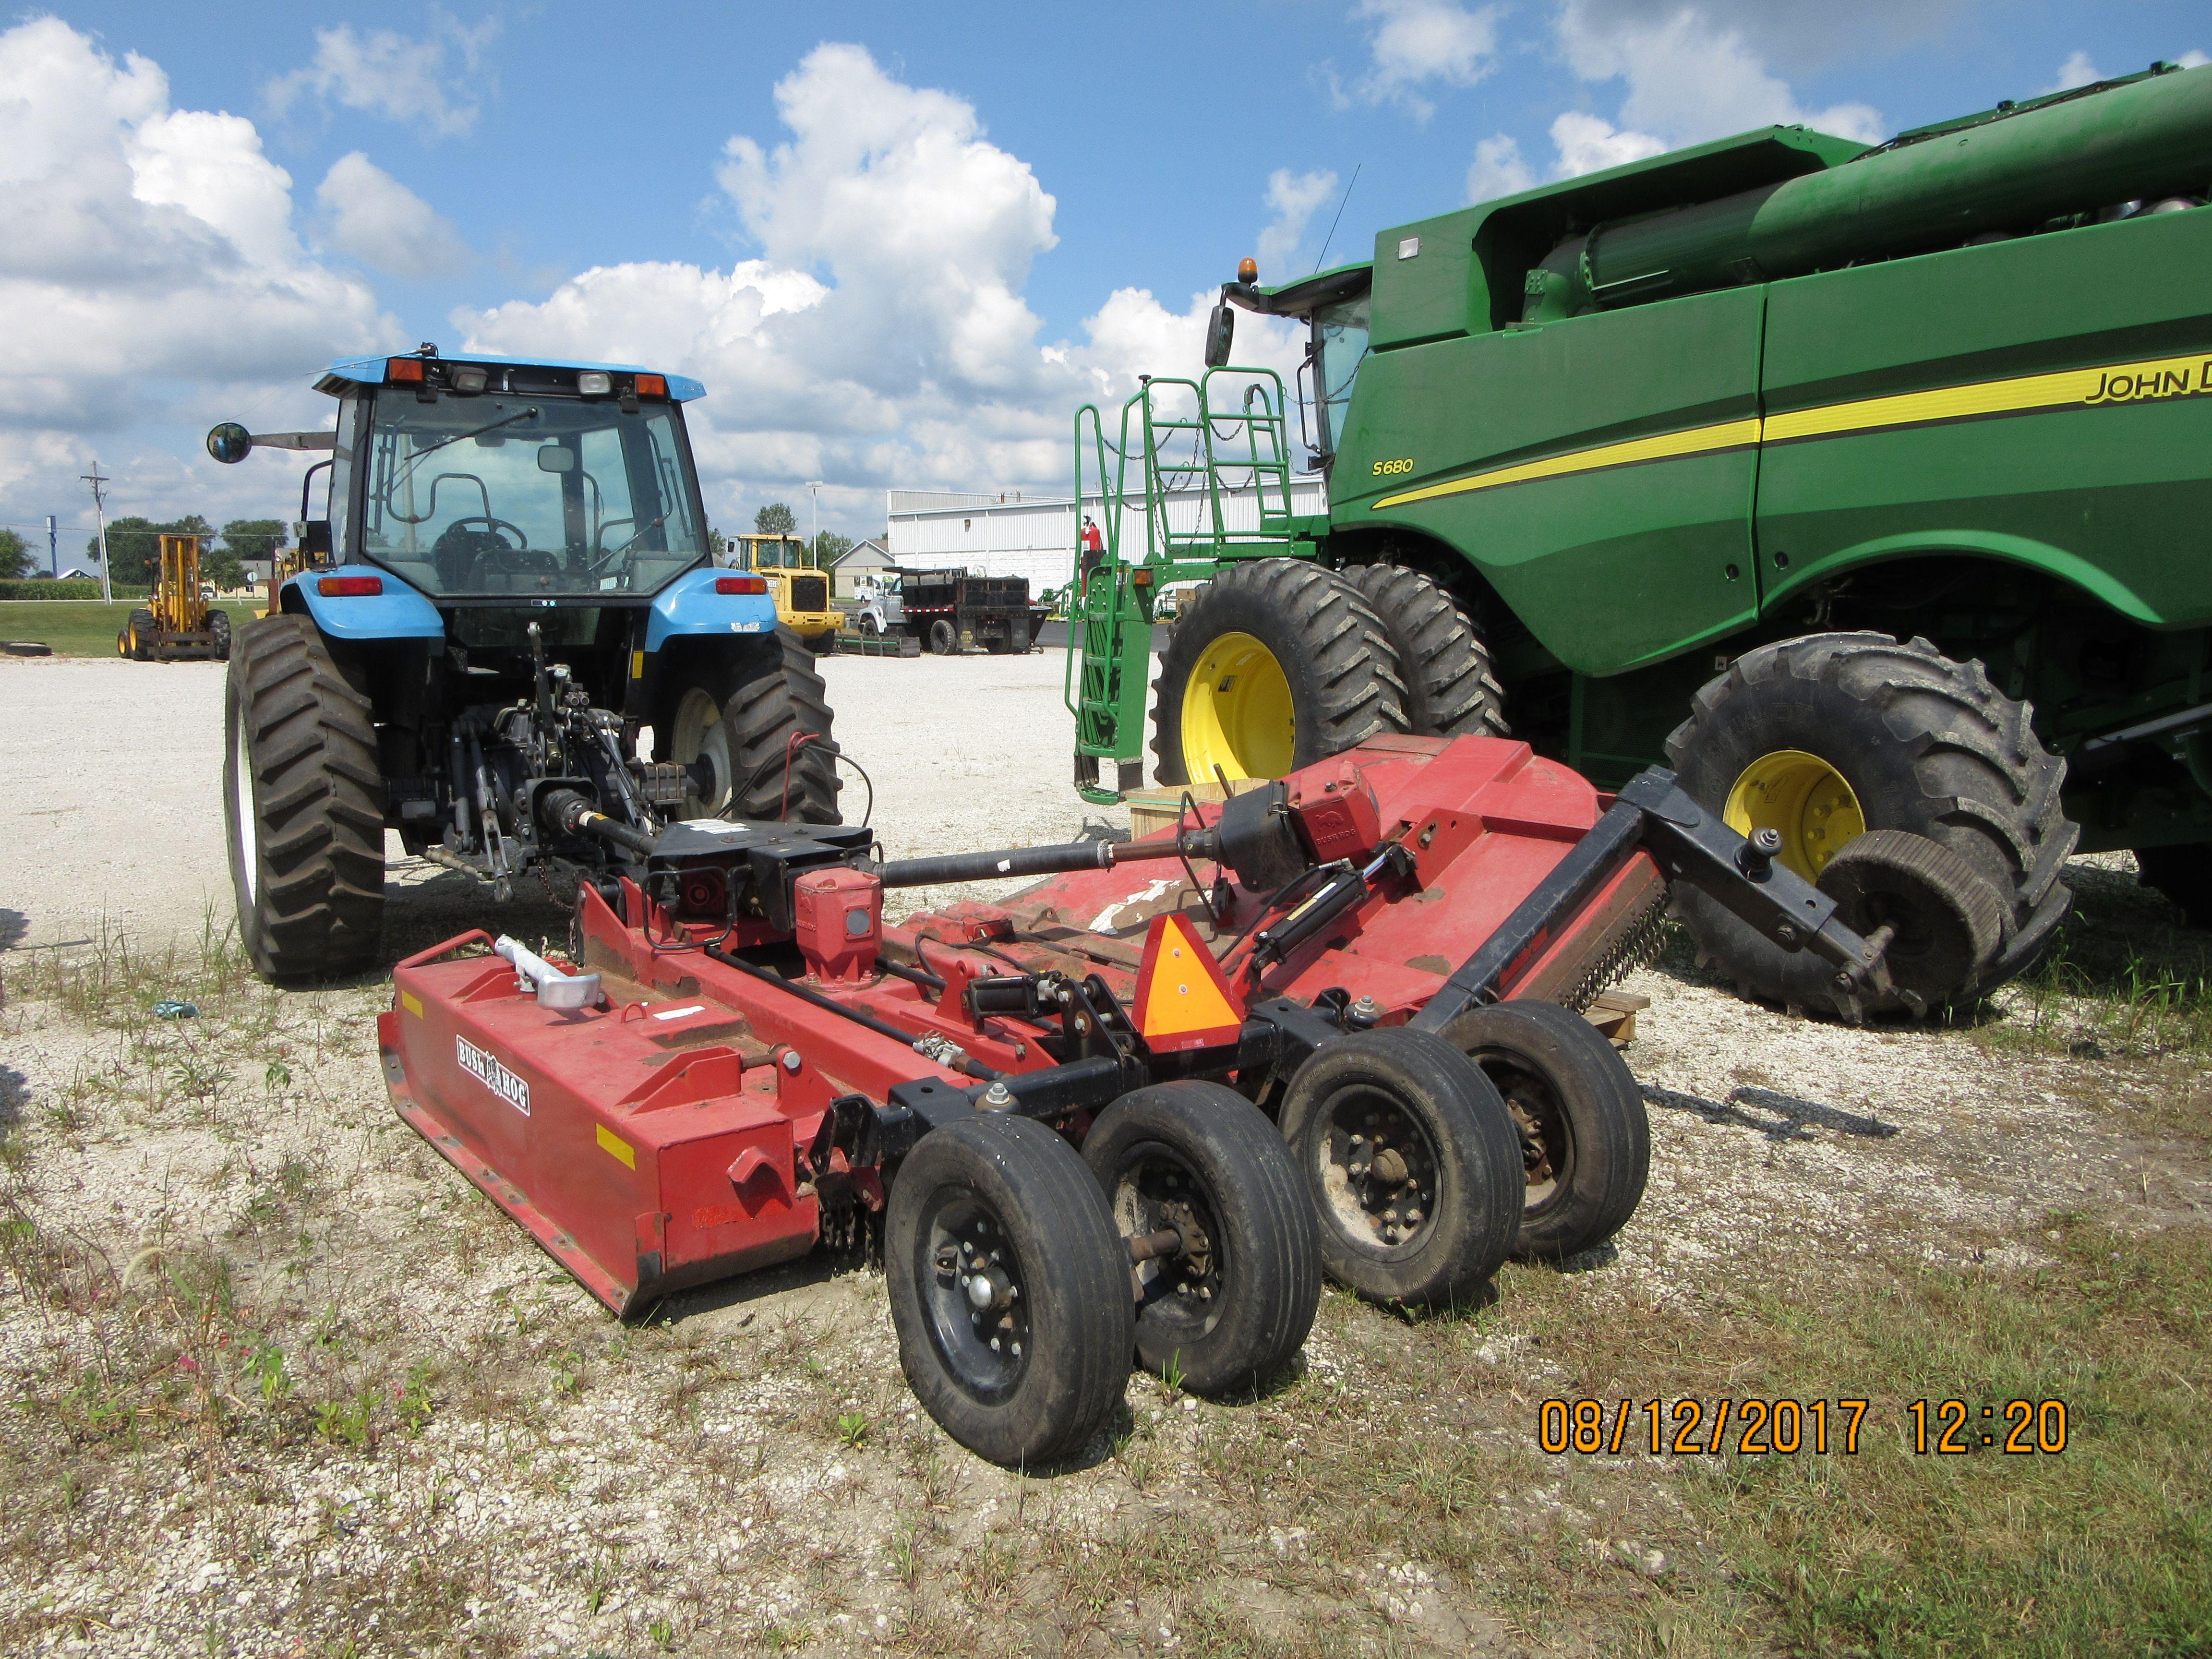 New Holland Ts100 Pulling A Bush Hog Mower Tg Tractor Frankfort